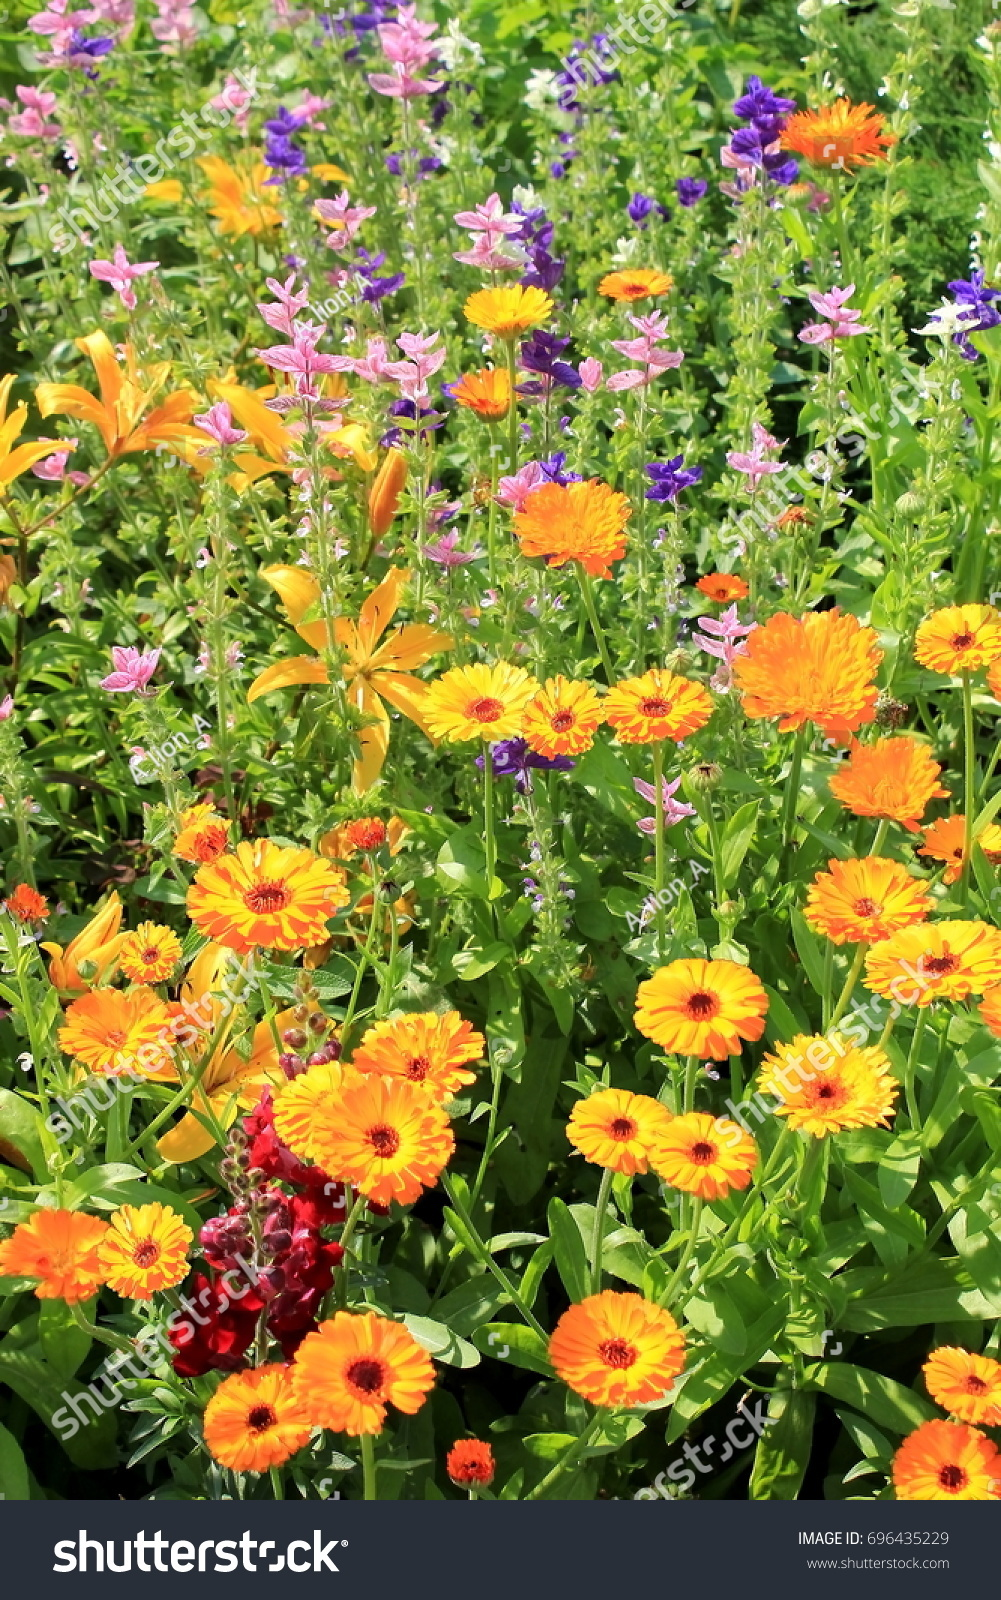 Beautiful natural background bright yellow flowers stock photo beautiful natural background with bright yellow flowers different wild flowers mightylinksfo